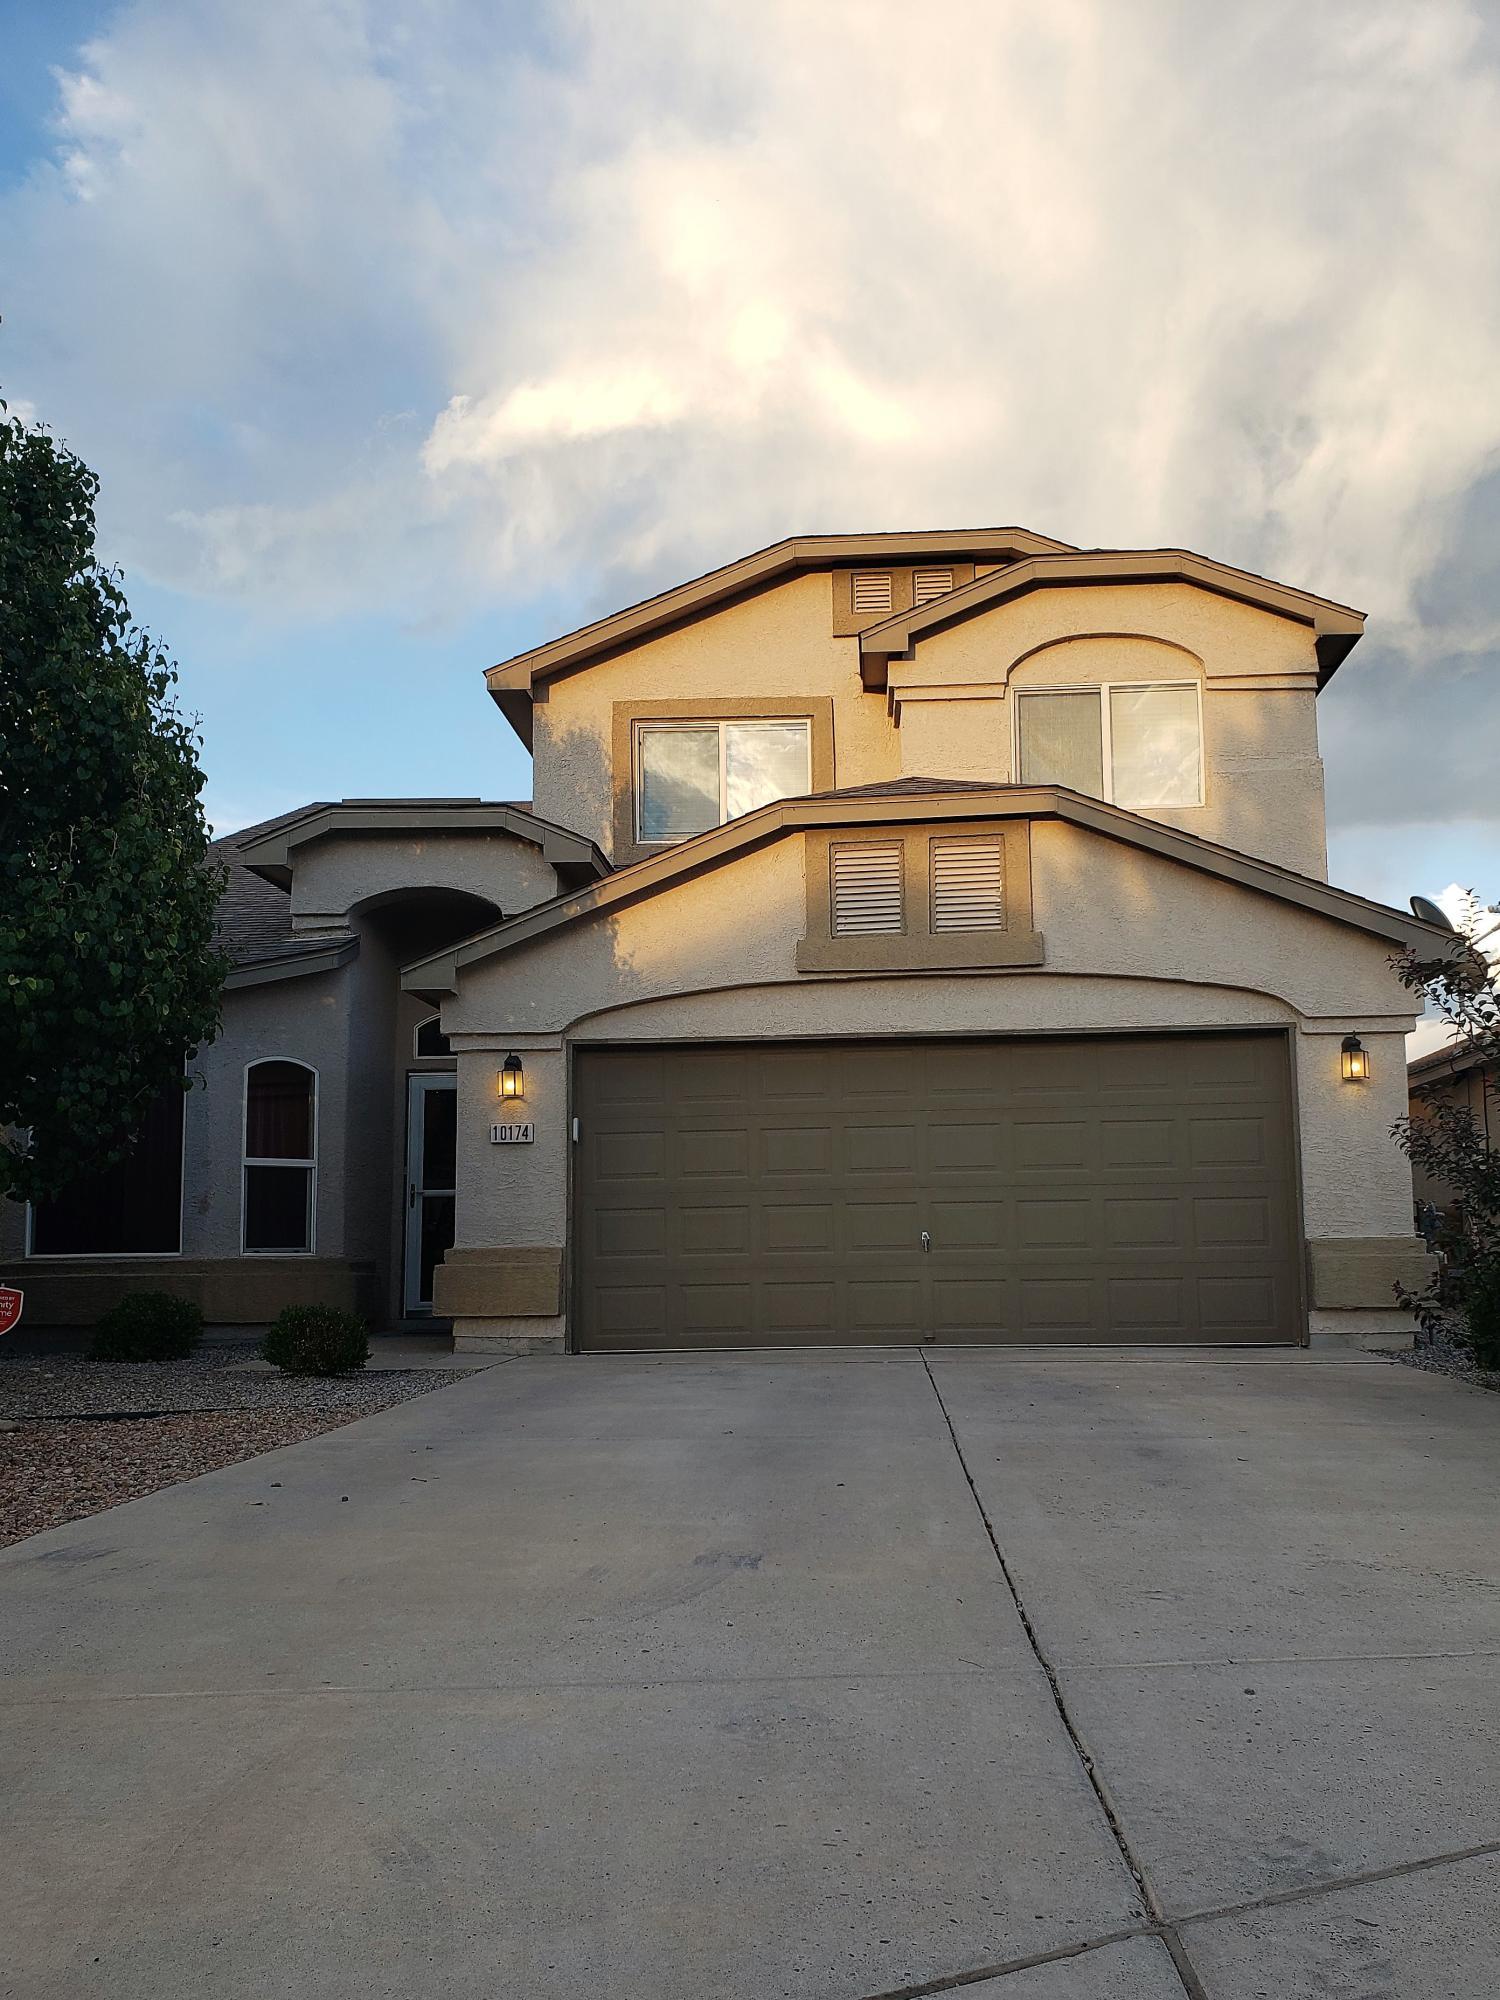 10174 CALLE CHULITA NW Property Photo - Albuquerque, NM real estate listing